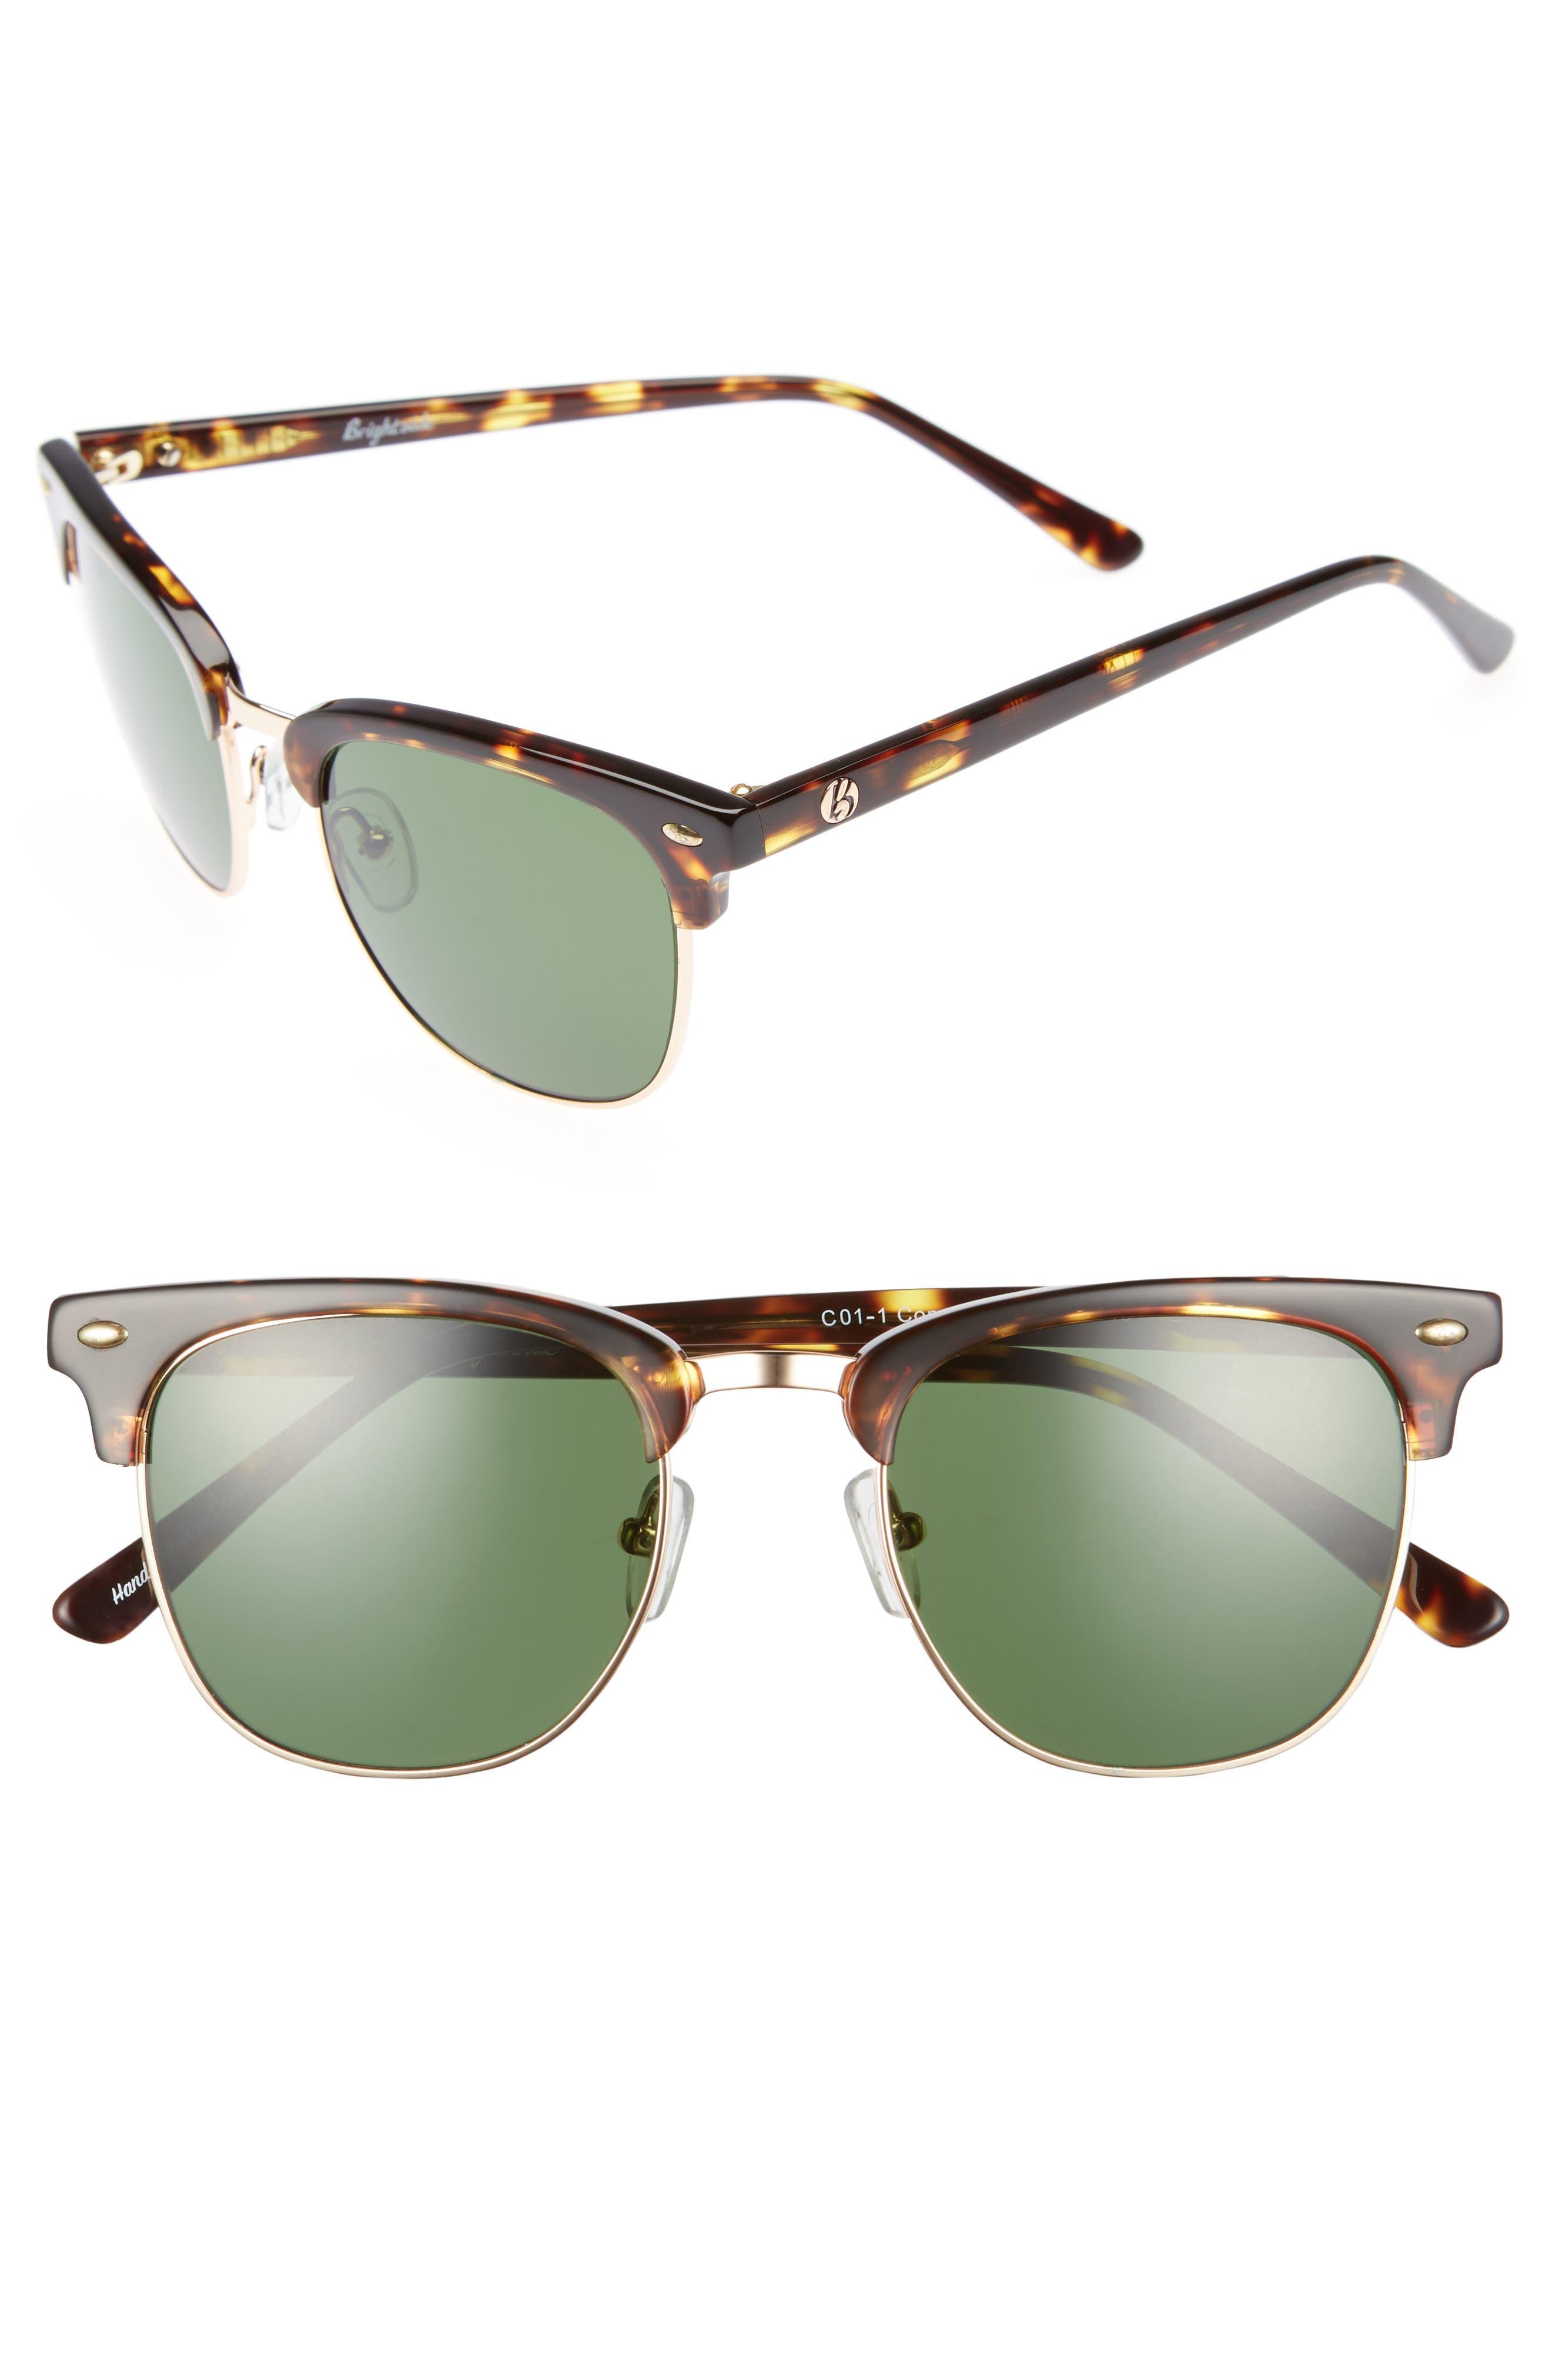 Main Image - Brightside Copeland 51mm Sunglasses